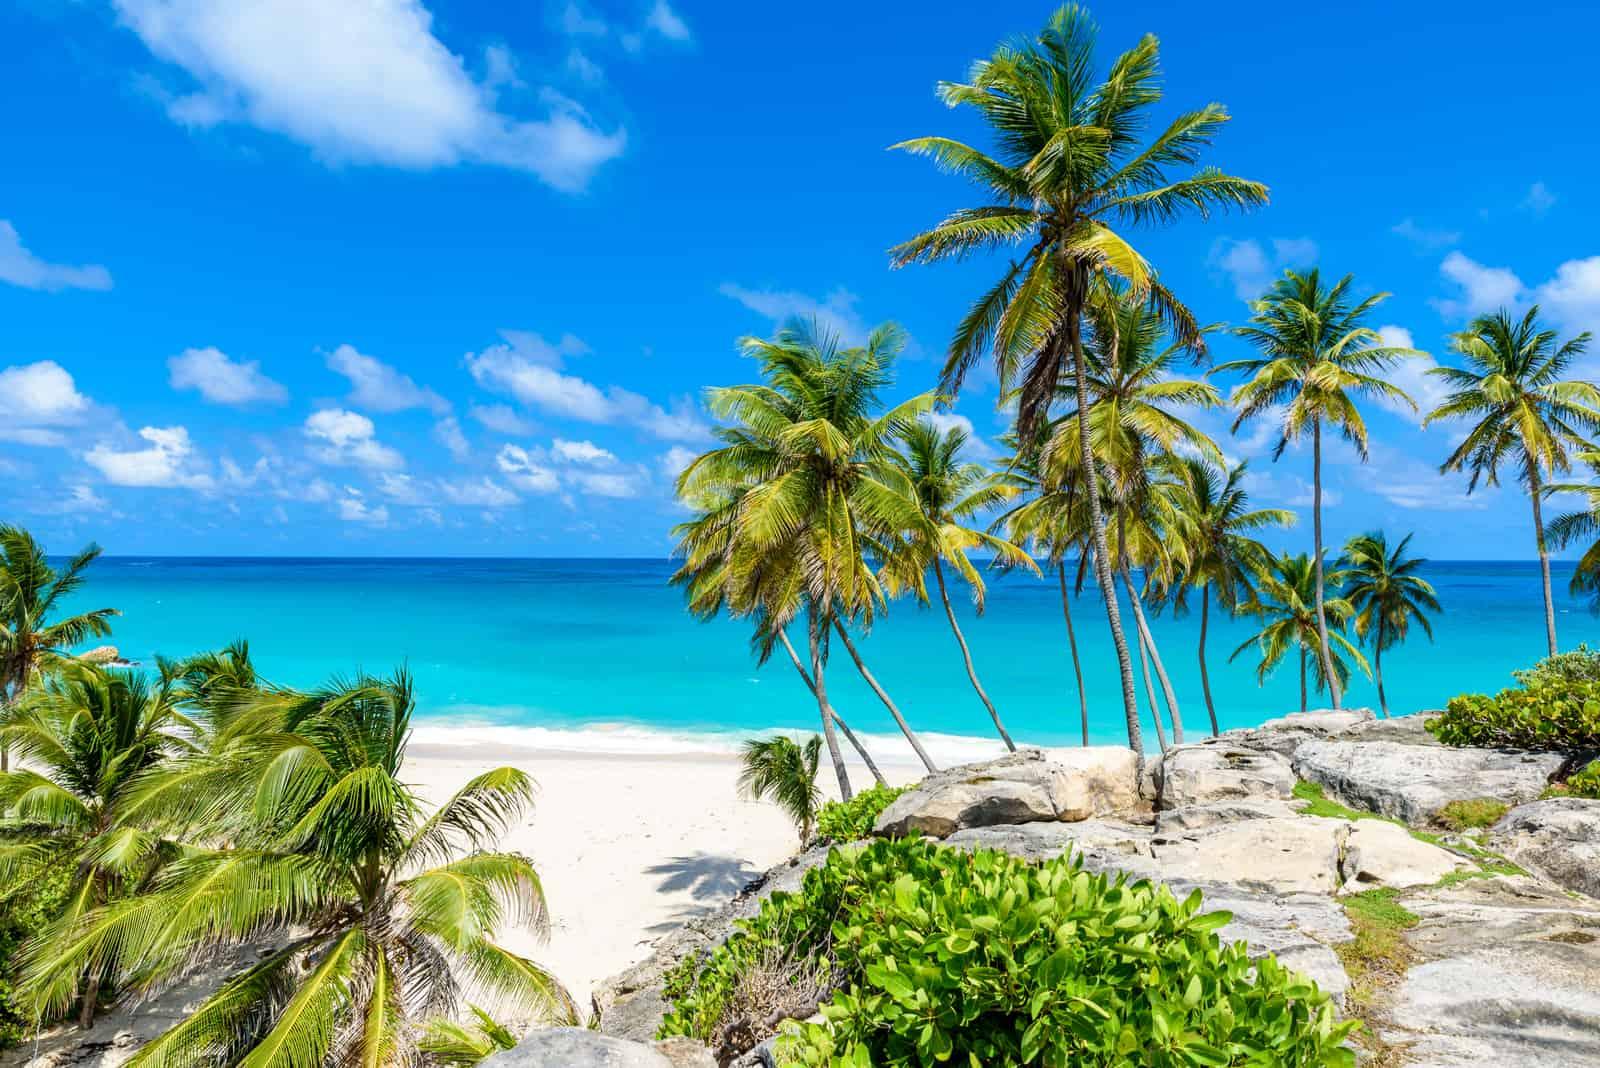 Paradiesstrand auf der Karibikinsel Barbados